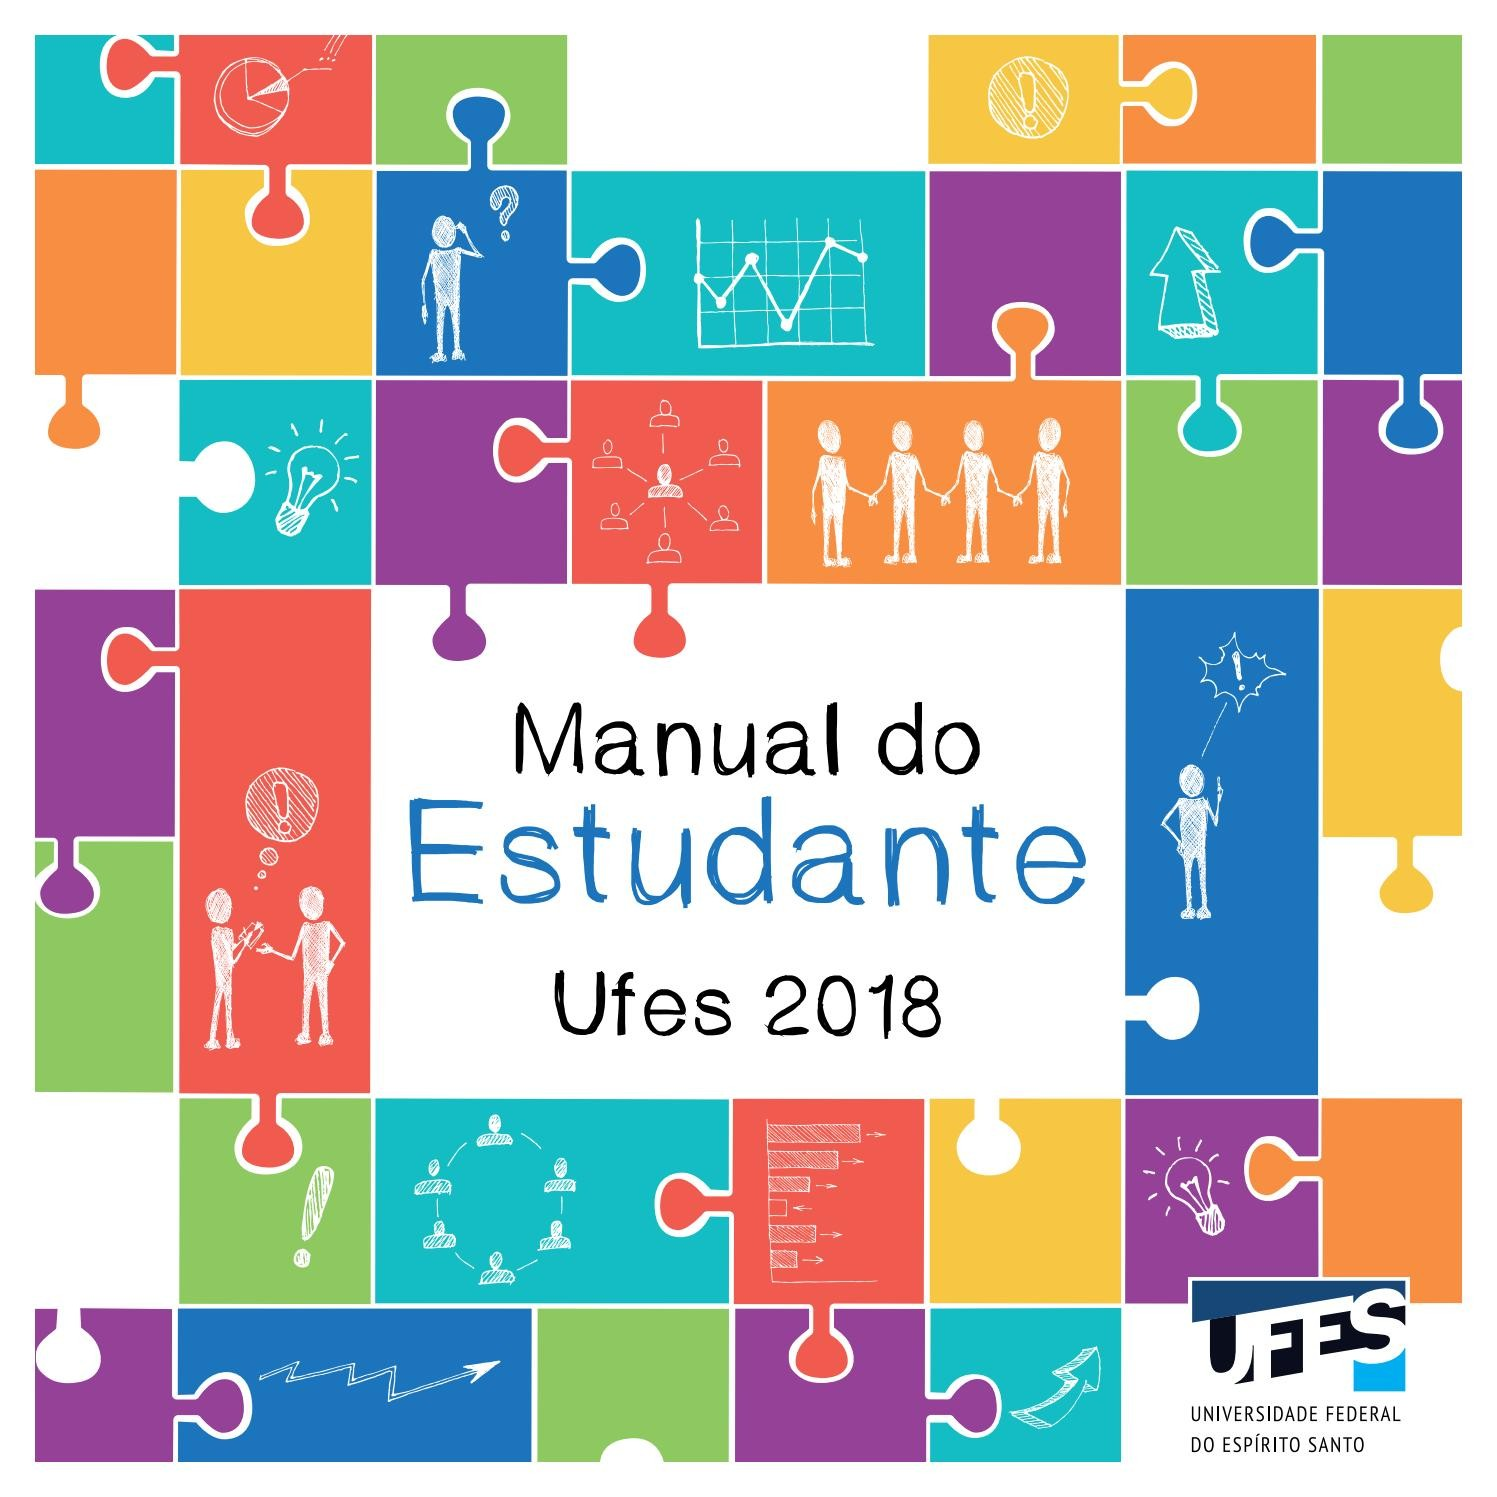 Manual do estudante 2018 by Universidade Federal do Esprito Santo